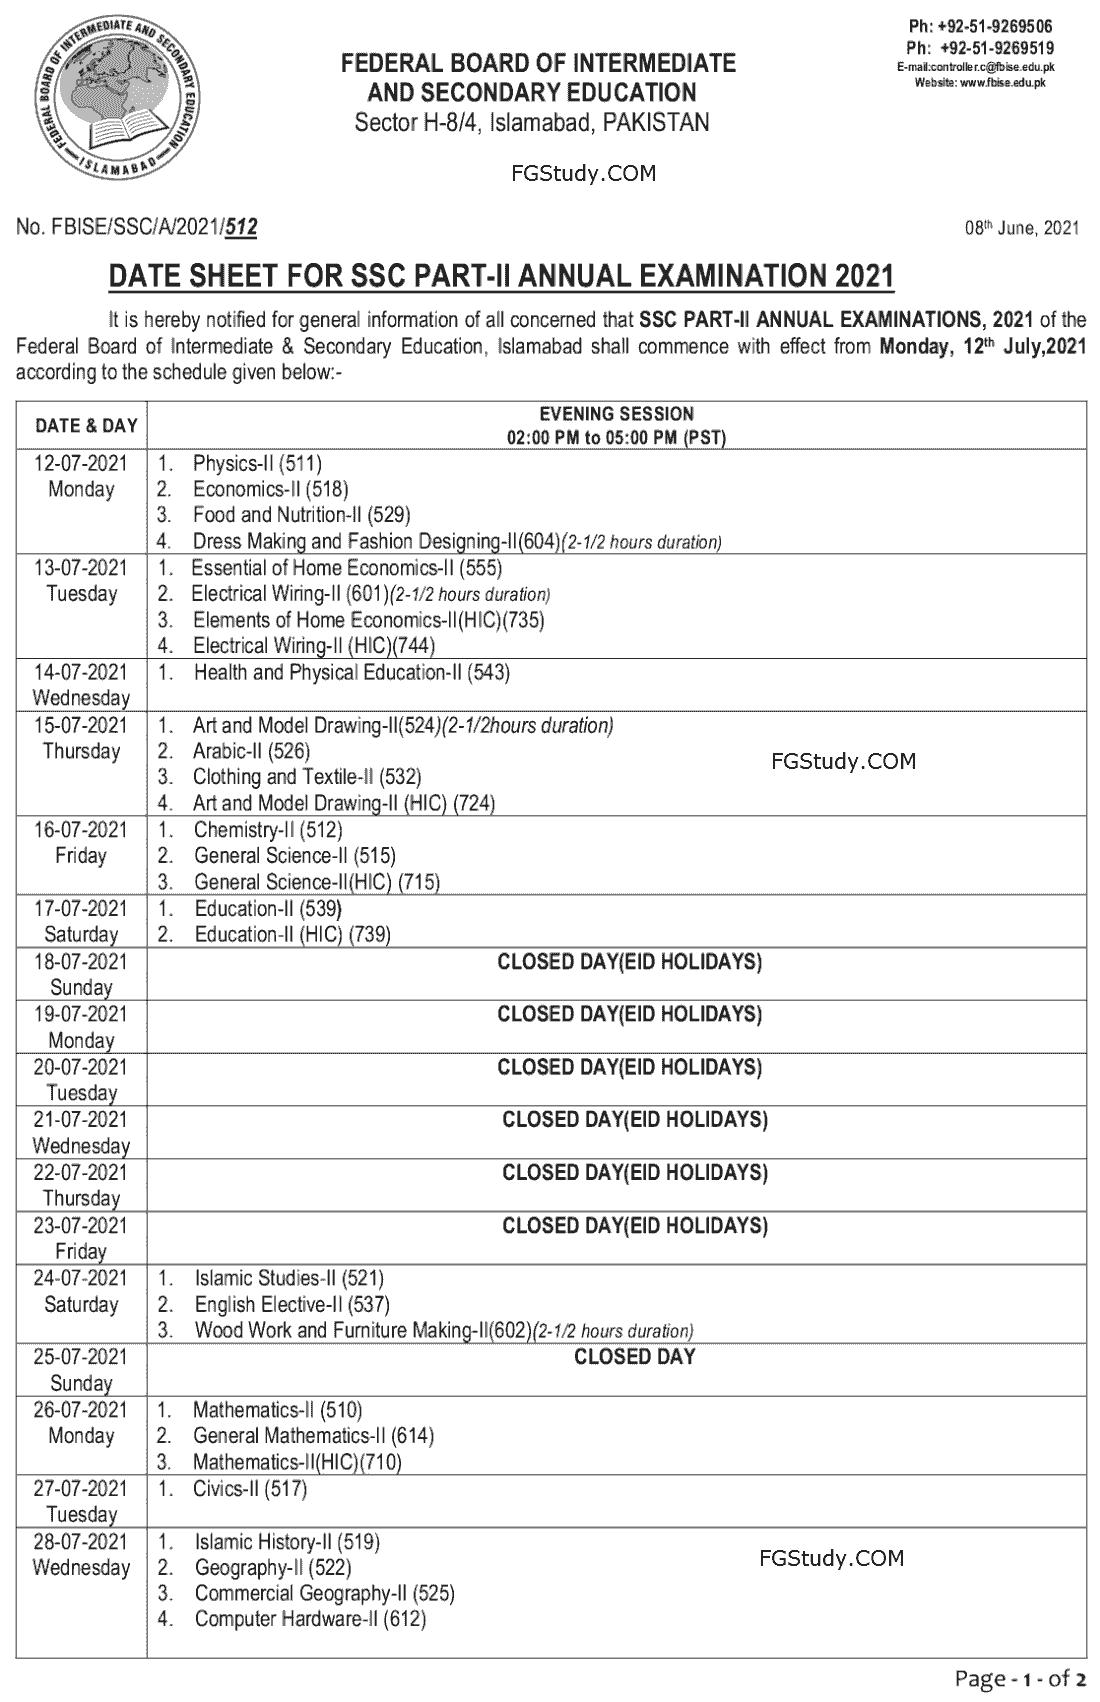 fbise-datesheet-2021-10th-class-p1.png